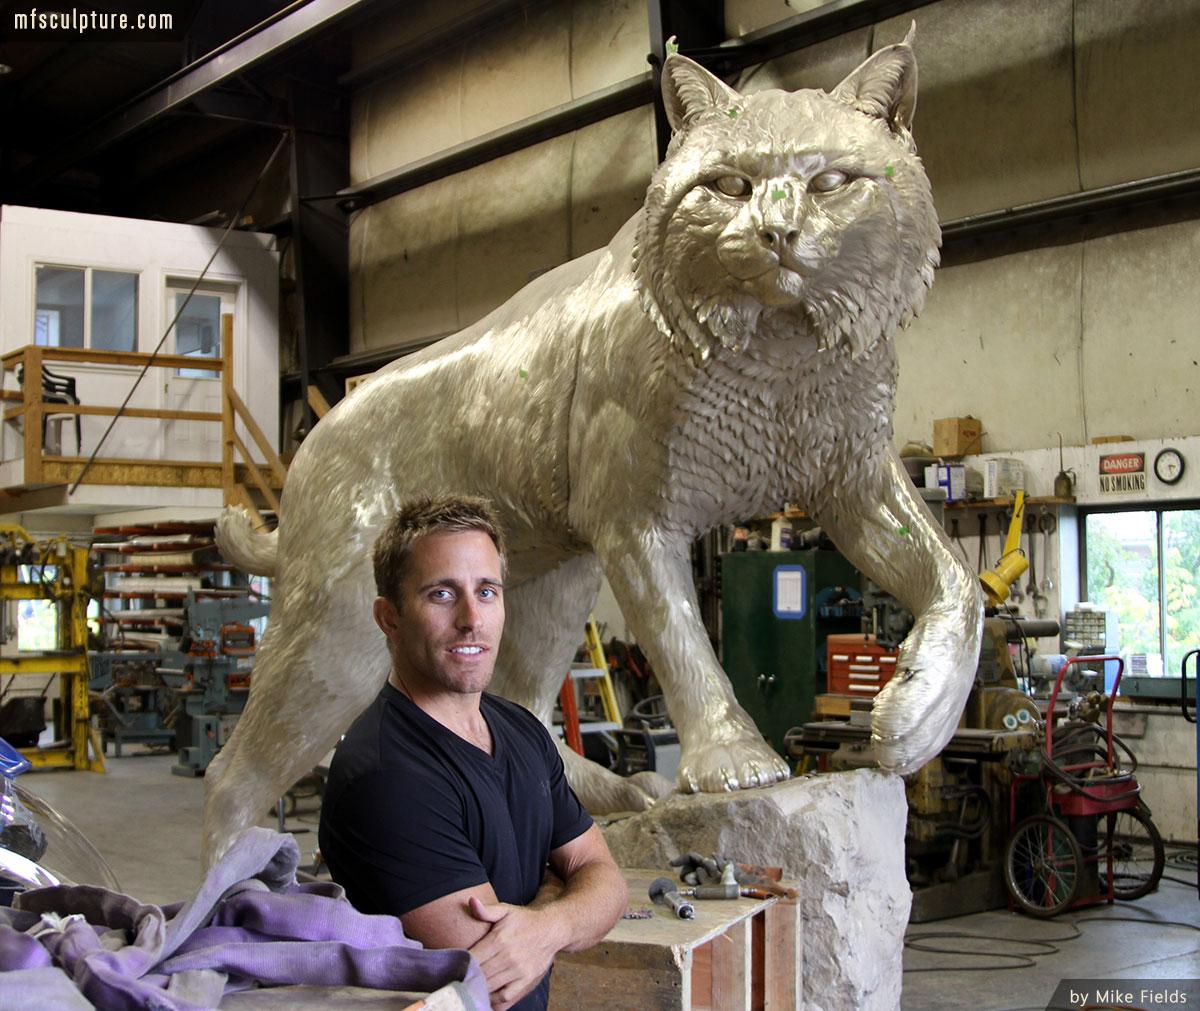 JWU University Wildcat Mascot Lost Wax Investment Casting Bobcat Monument 15